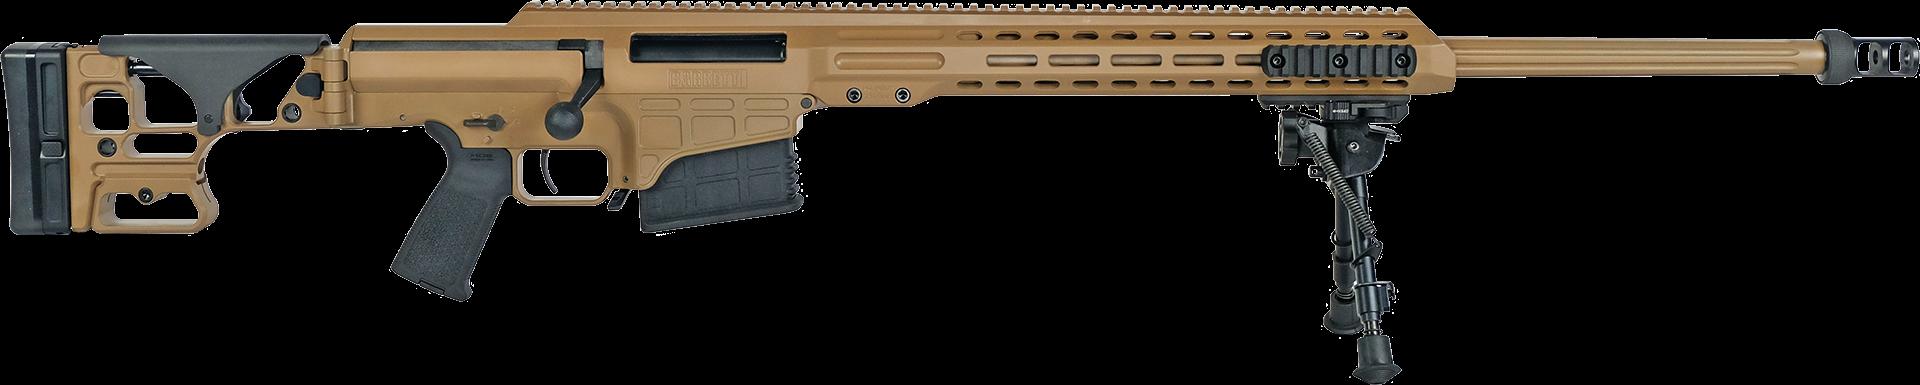 Barrett Firearms MK22 ADVANCED SNIPER SYSTEM 300 NORMA MAGNUM